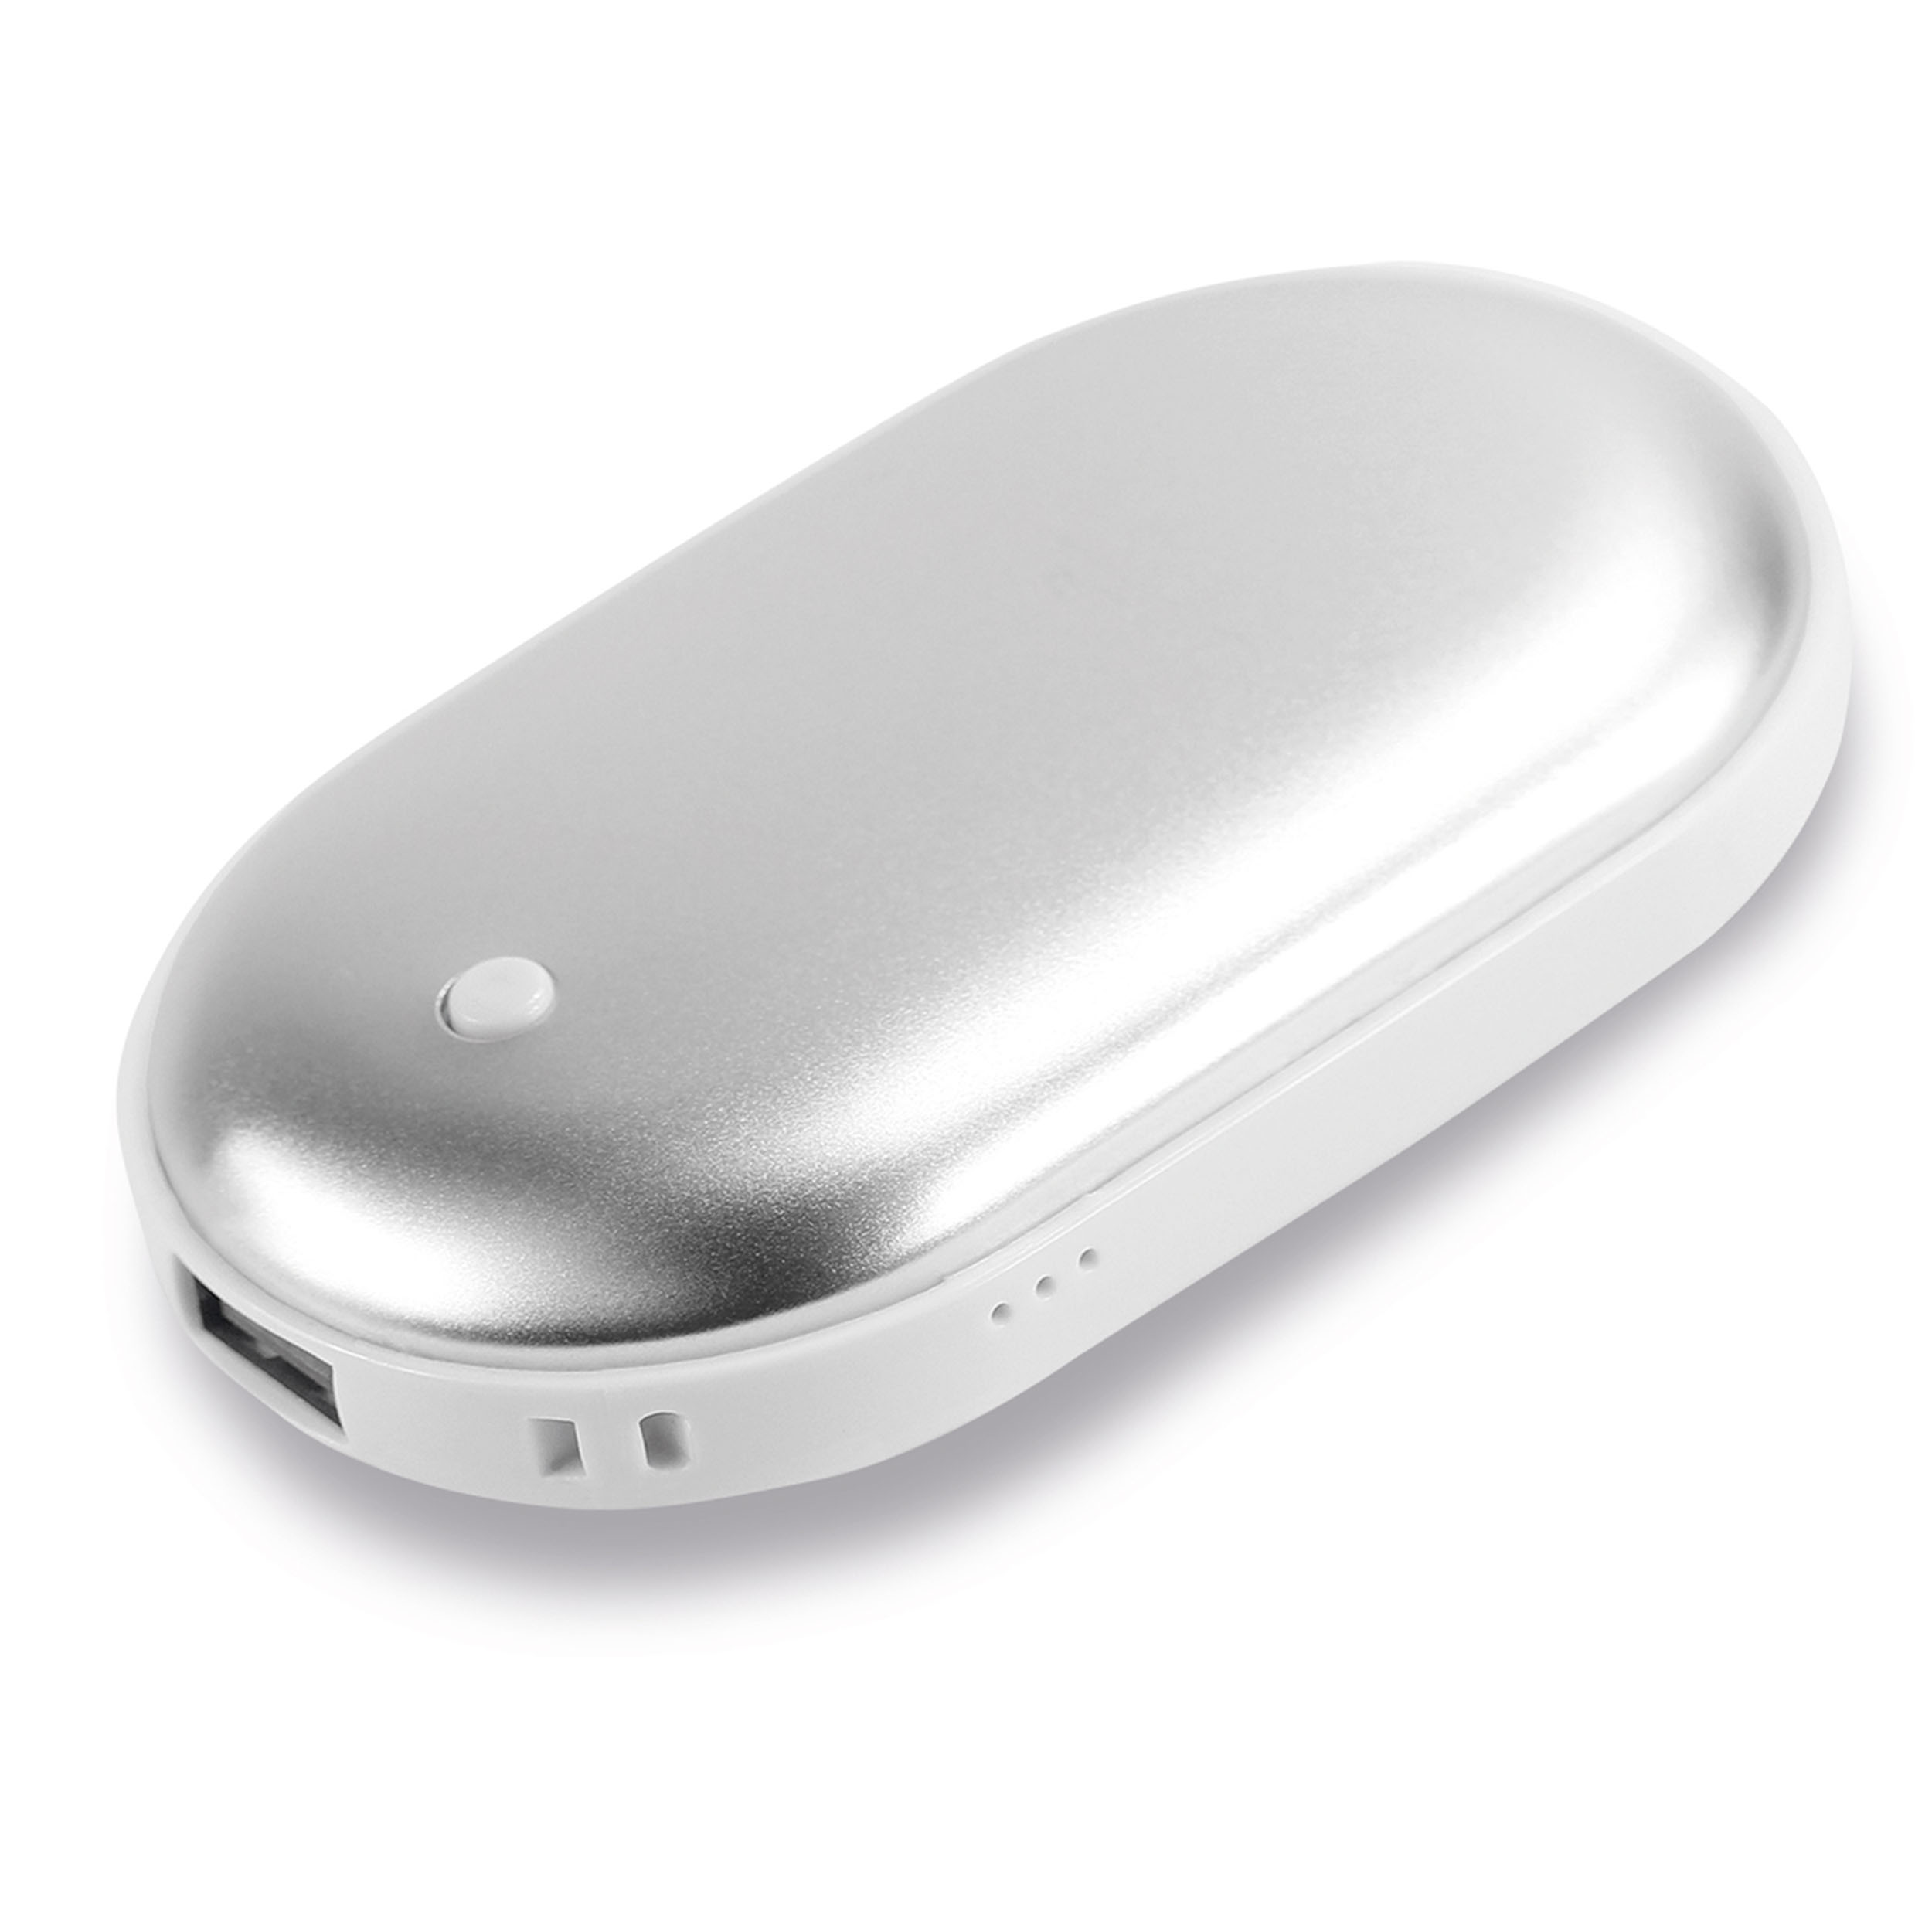 Cald Handwärmer und USB Powerbank